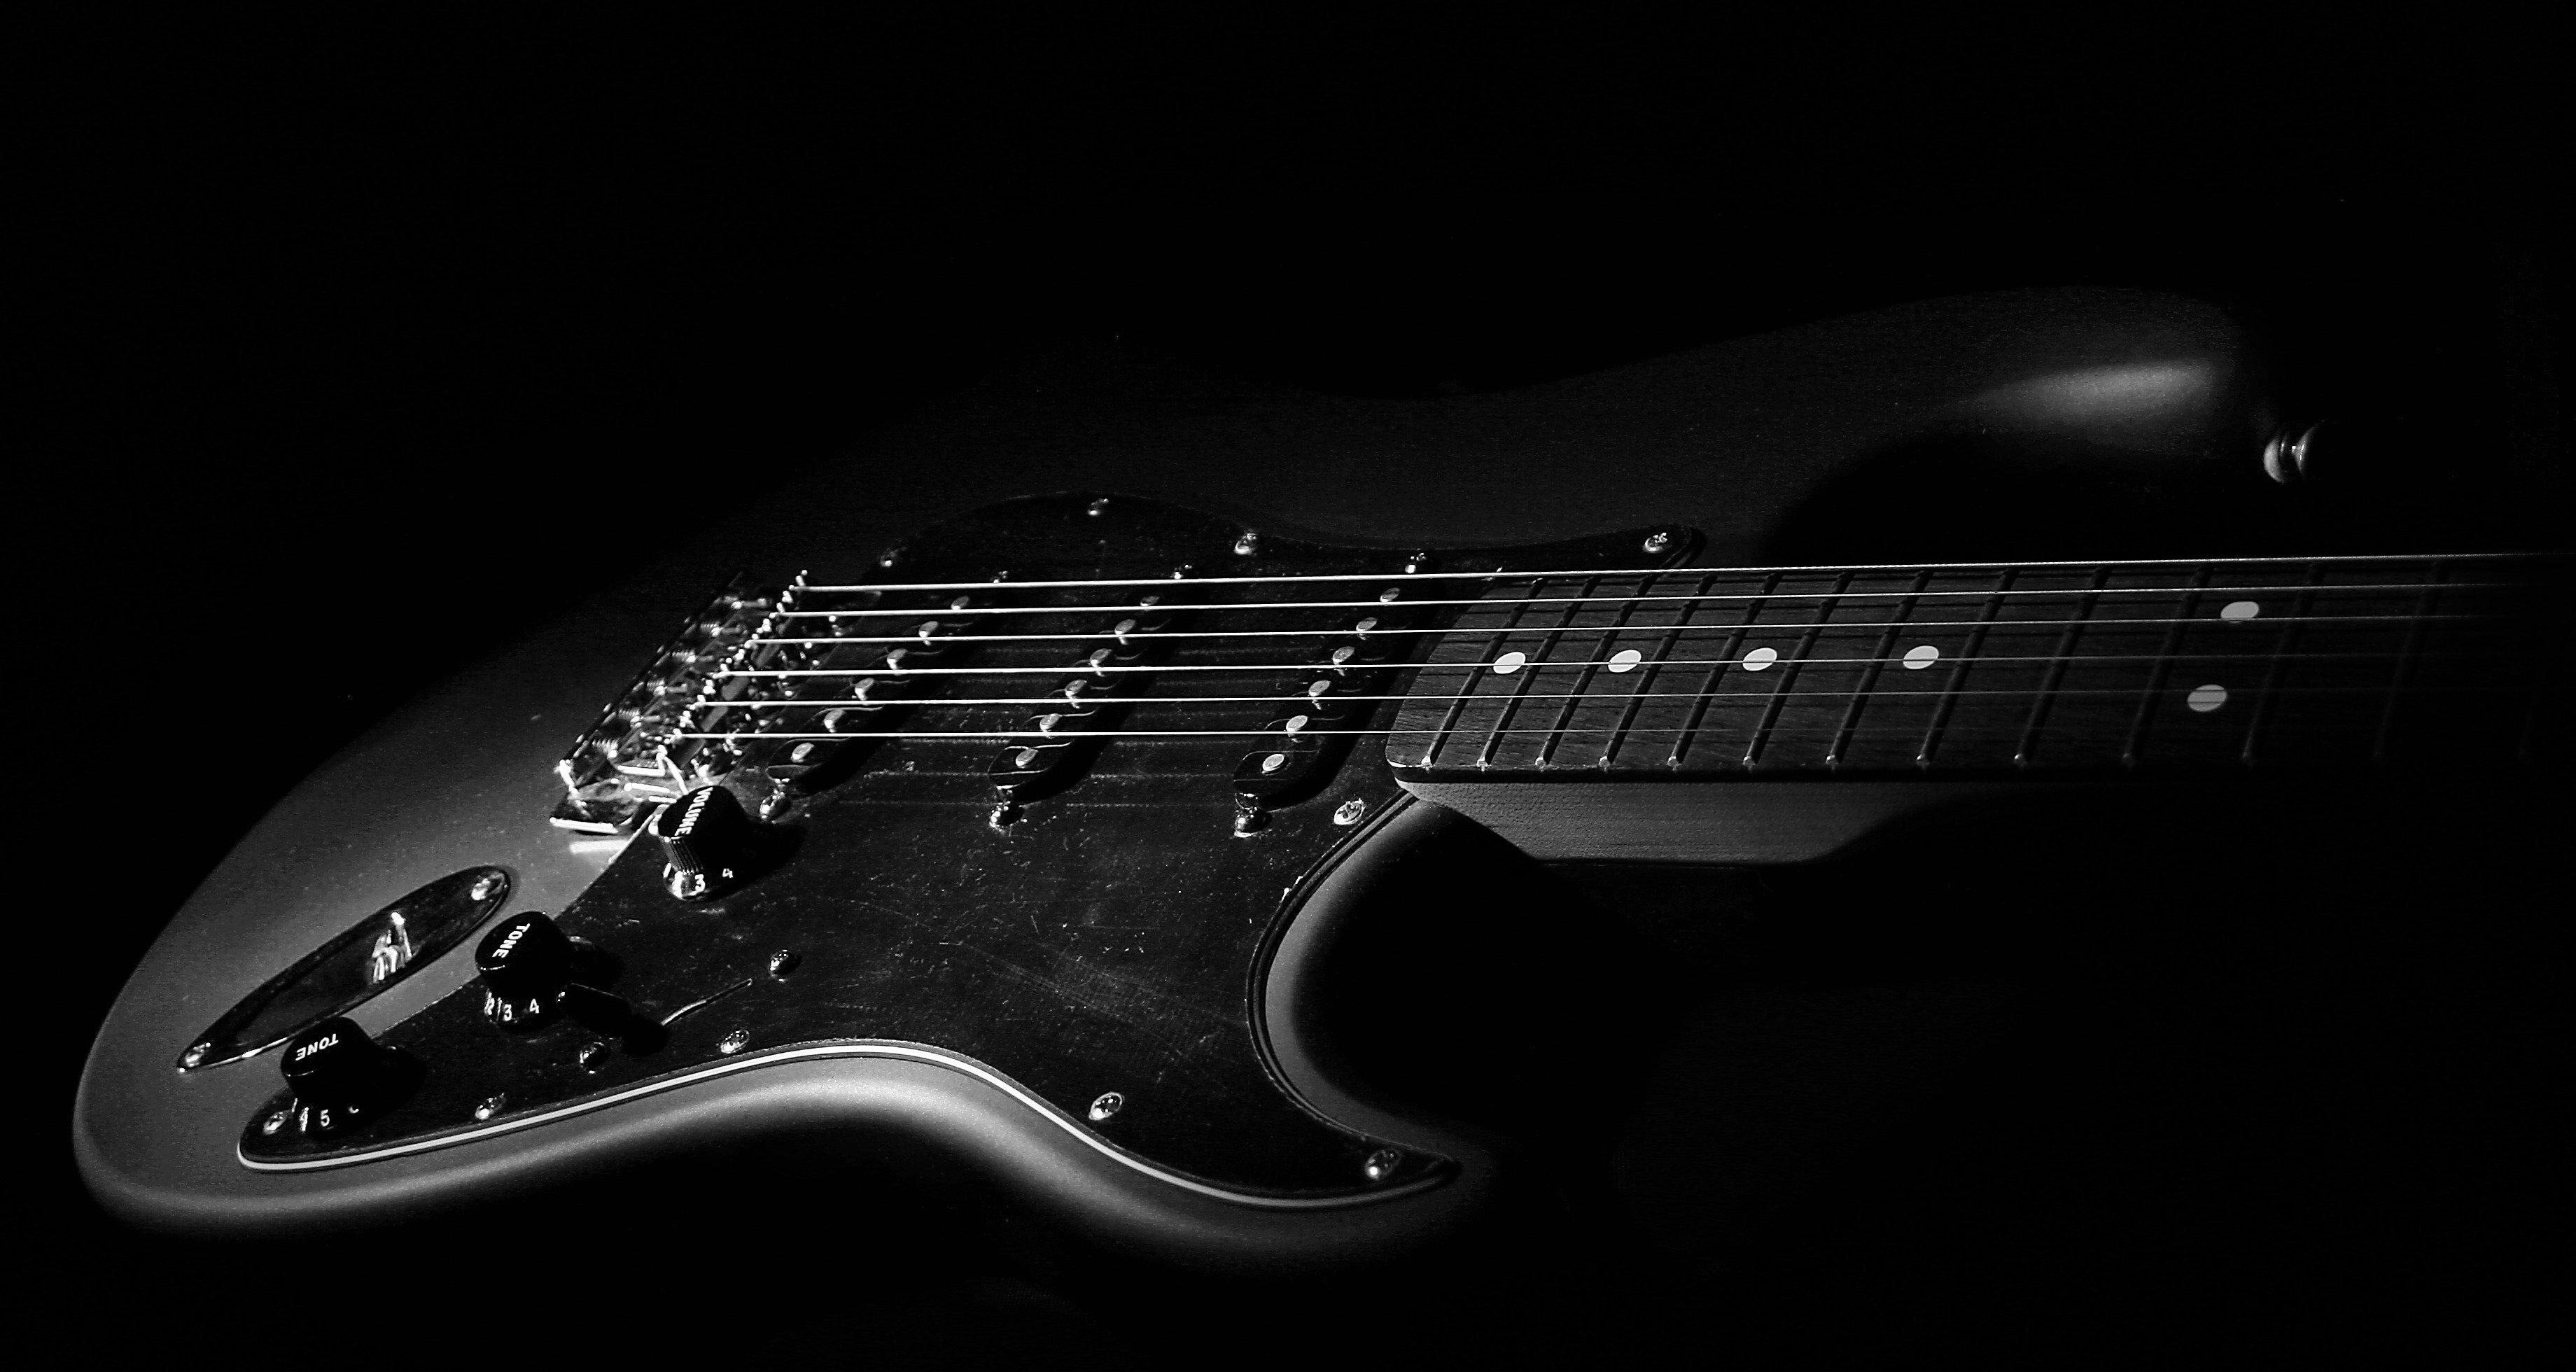 ultimate guitar addon for kodi and xbmc